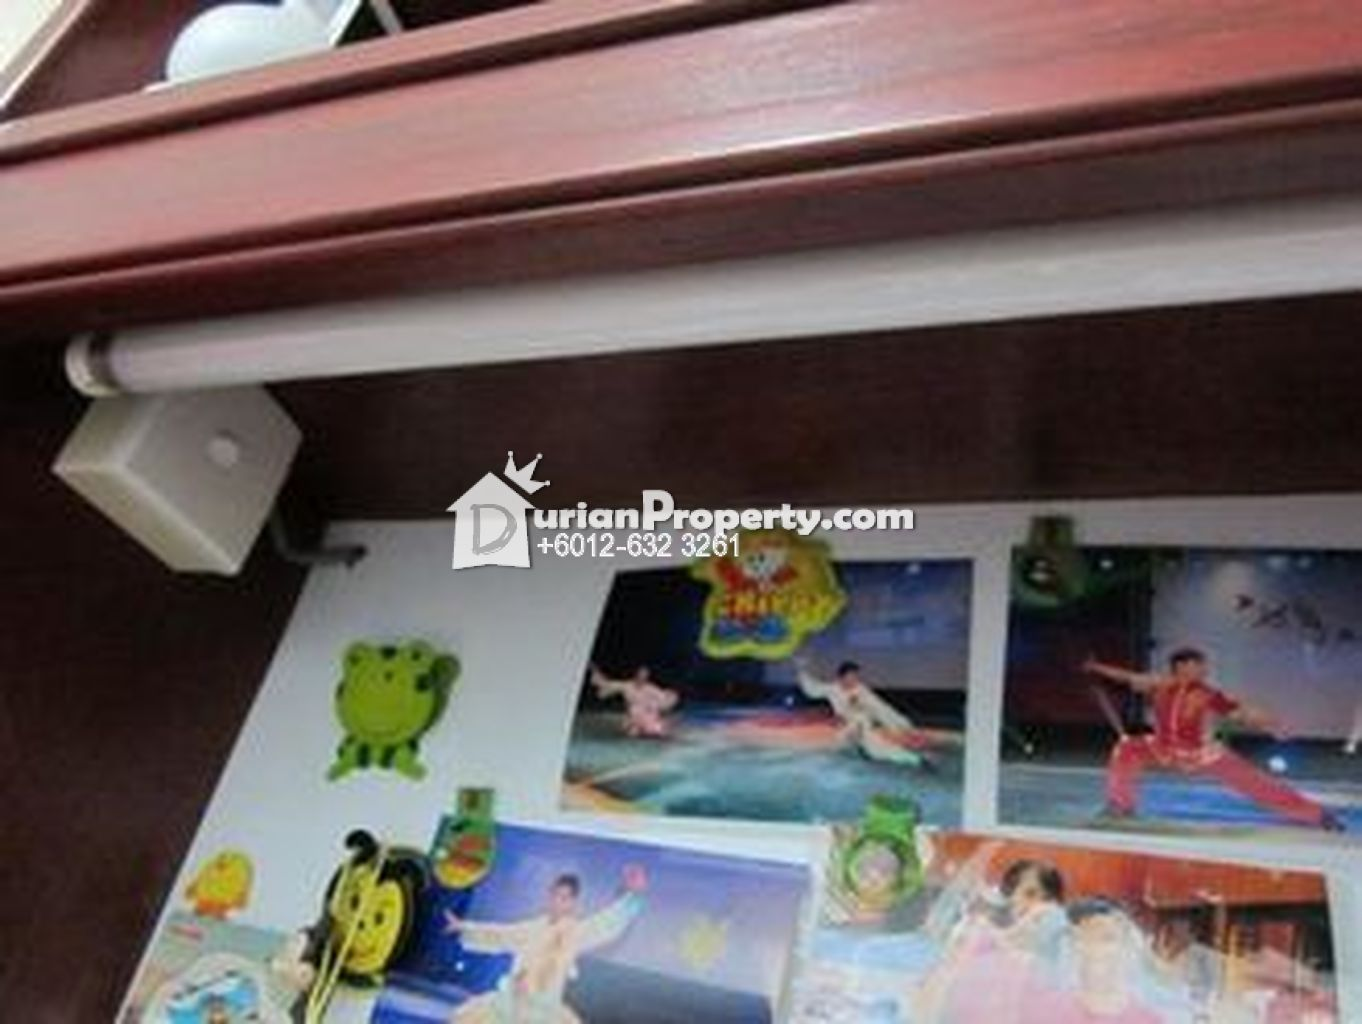 Children study cabinet For Sale